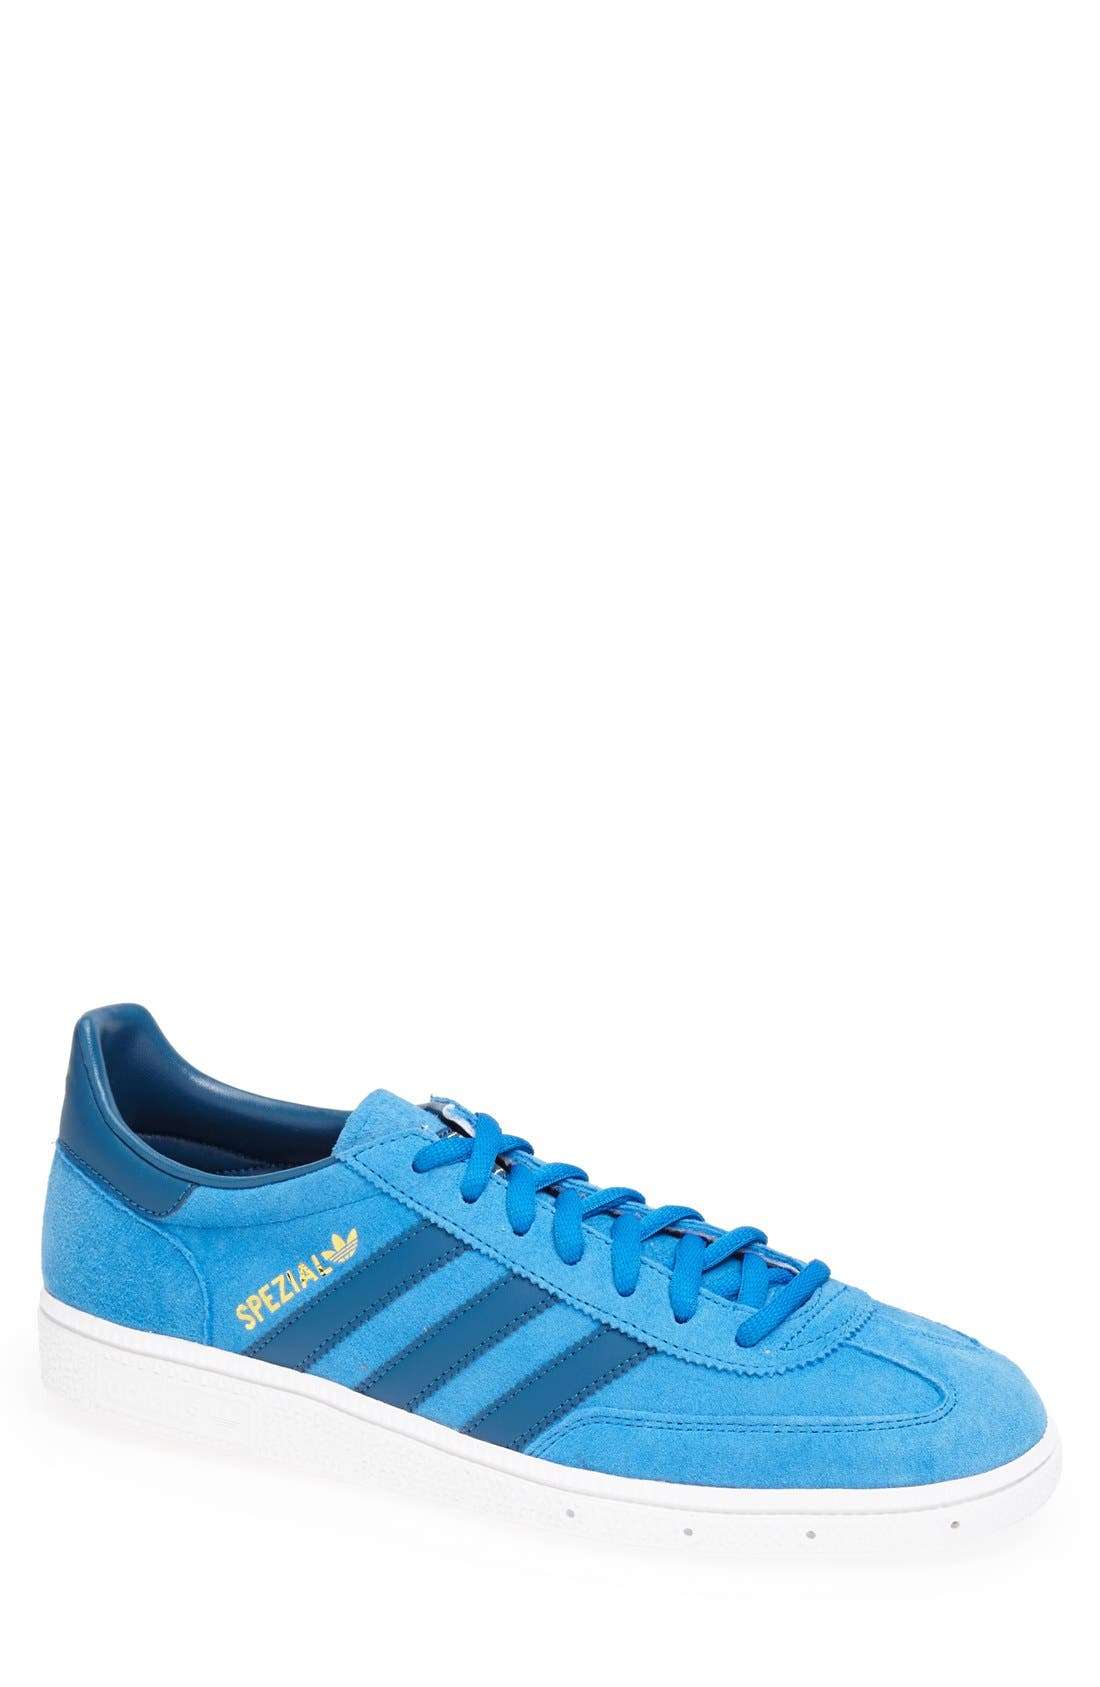 Main Image - adidas 'Spezial' Sneaker (Men)